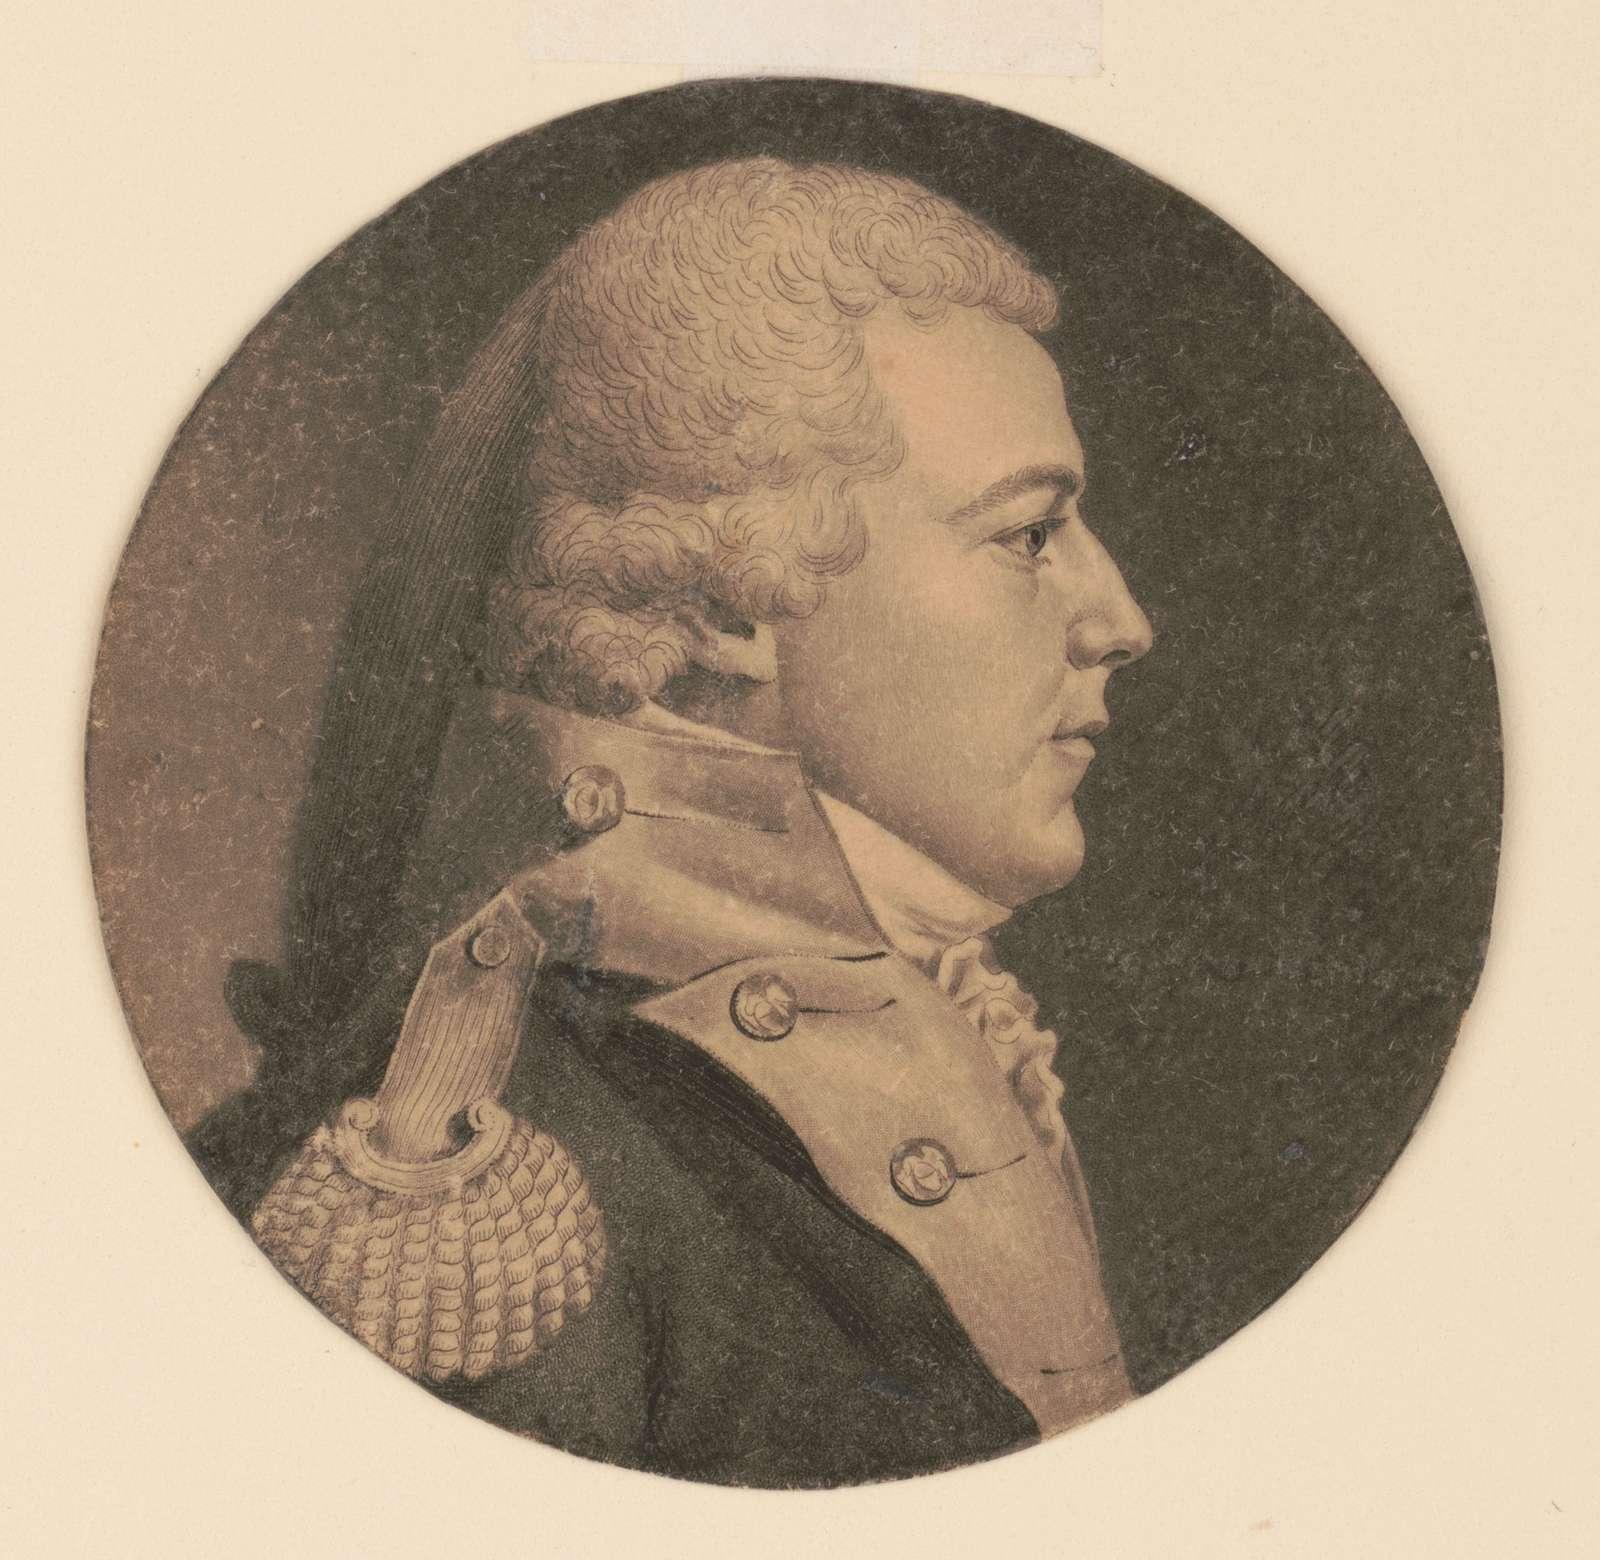 Captain Thompson, head-and-shoulders portrait, right profile